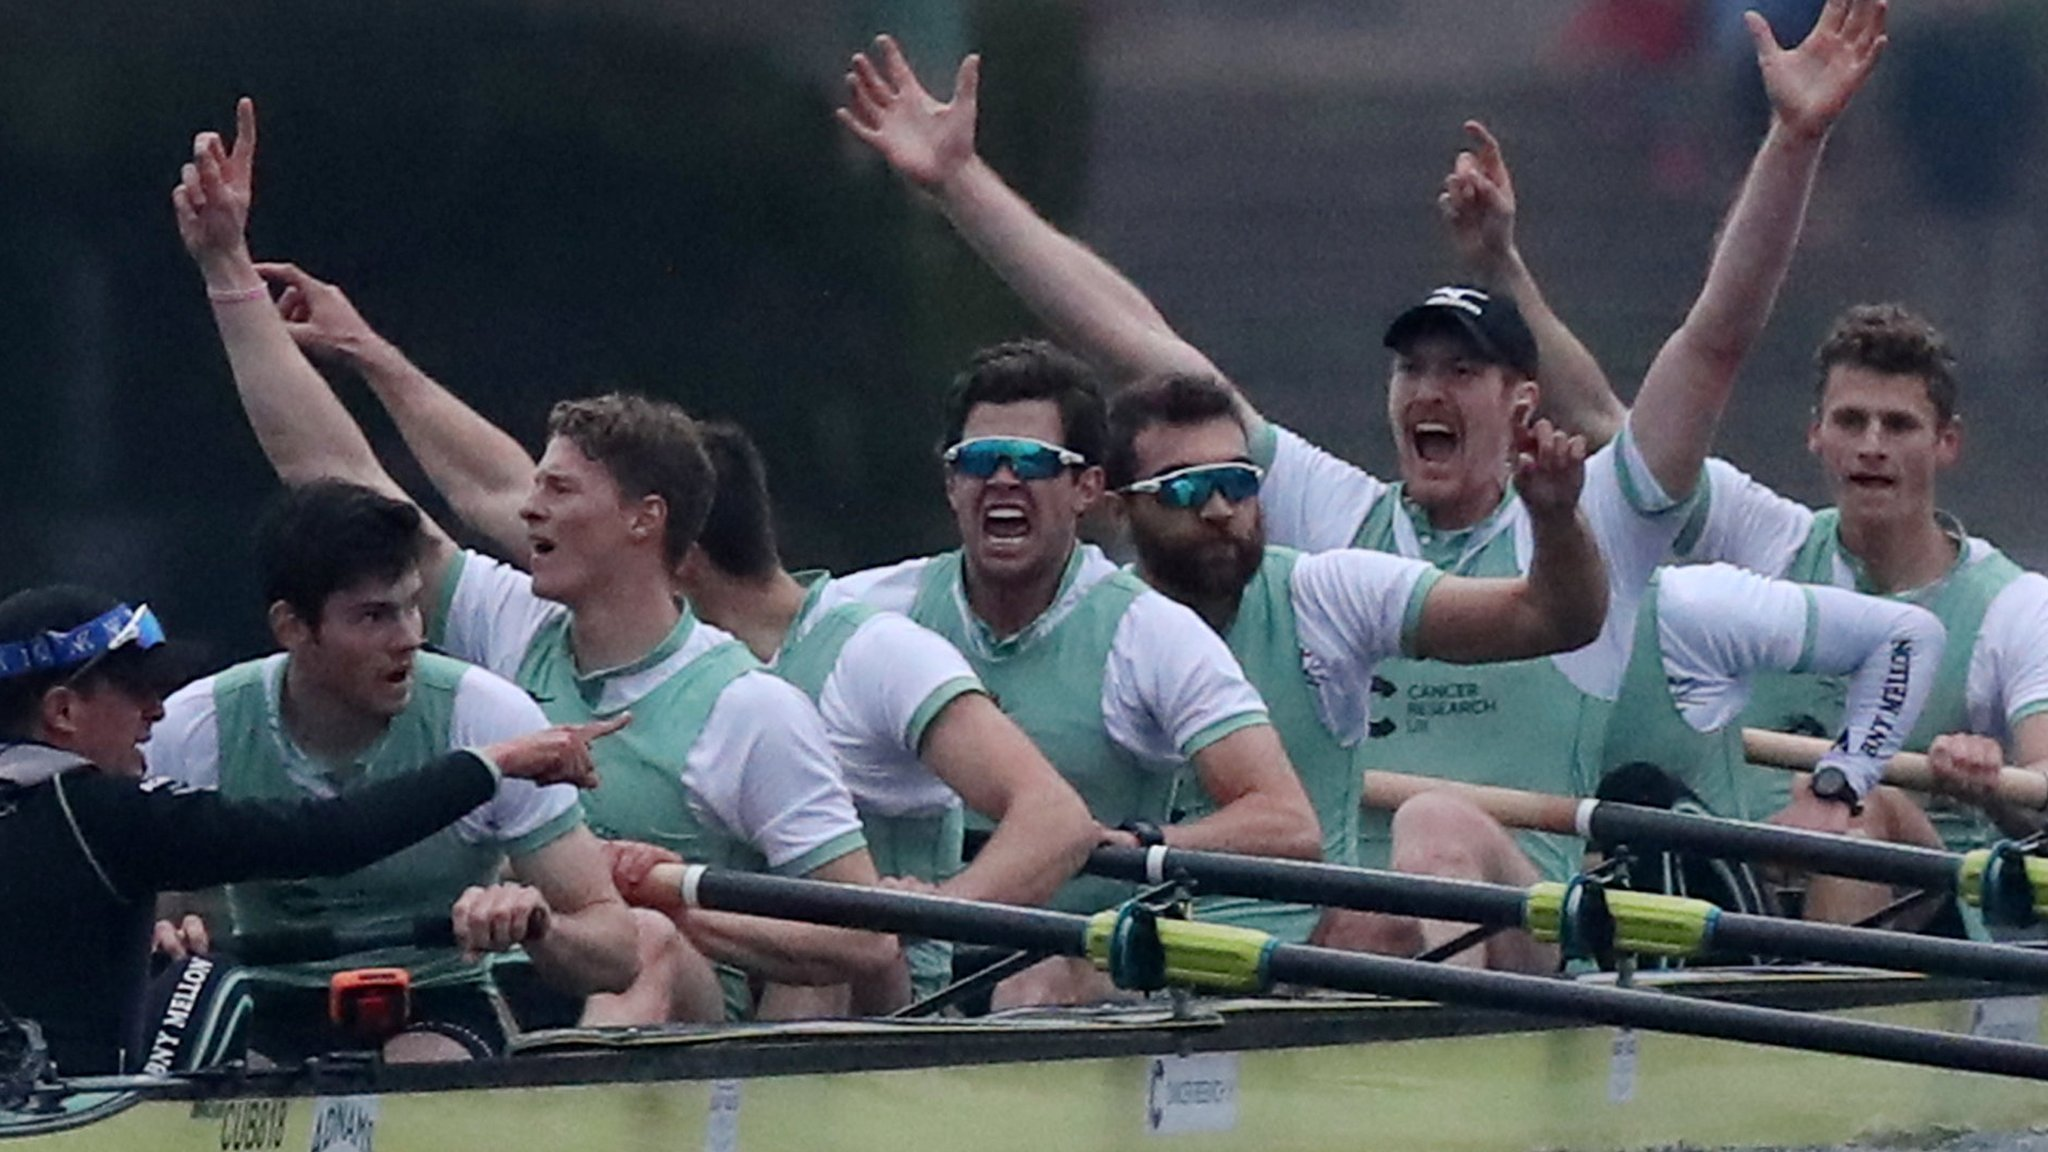 Boat Races 2018: Cambridge enjoy convincing men's & women's wins over Oxford